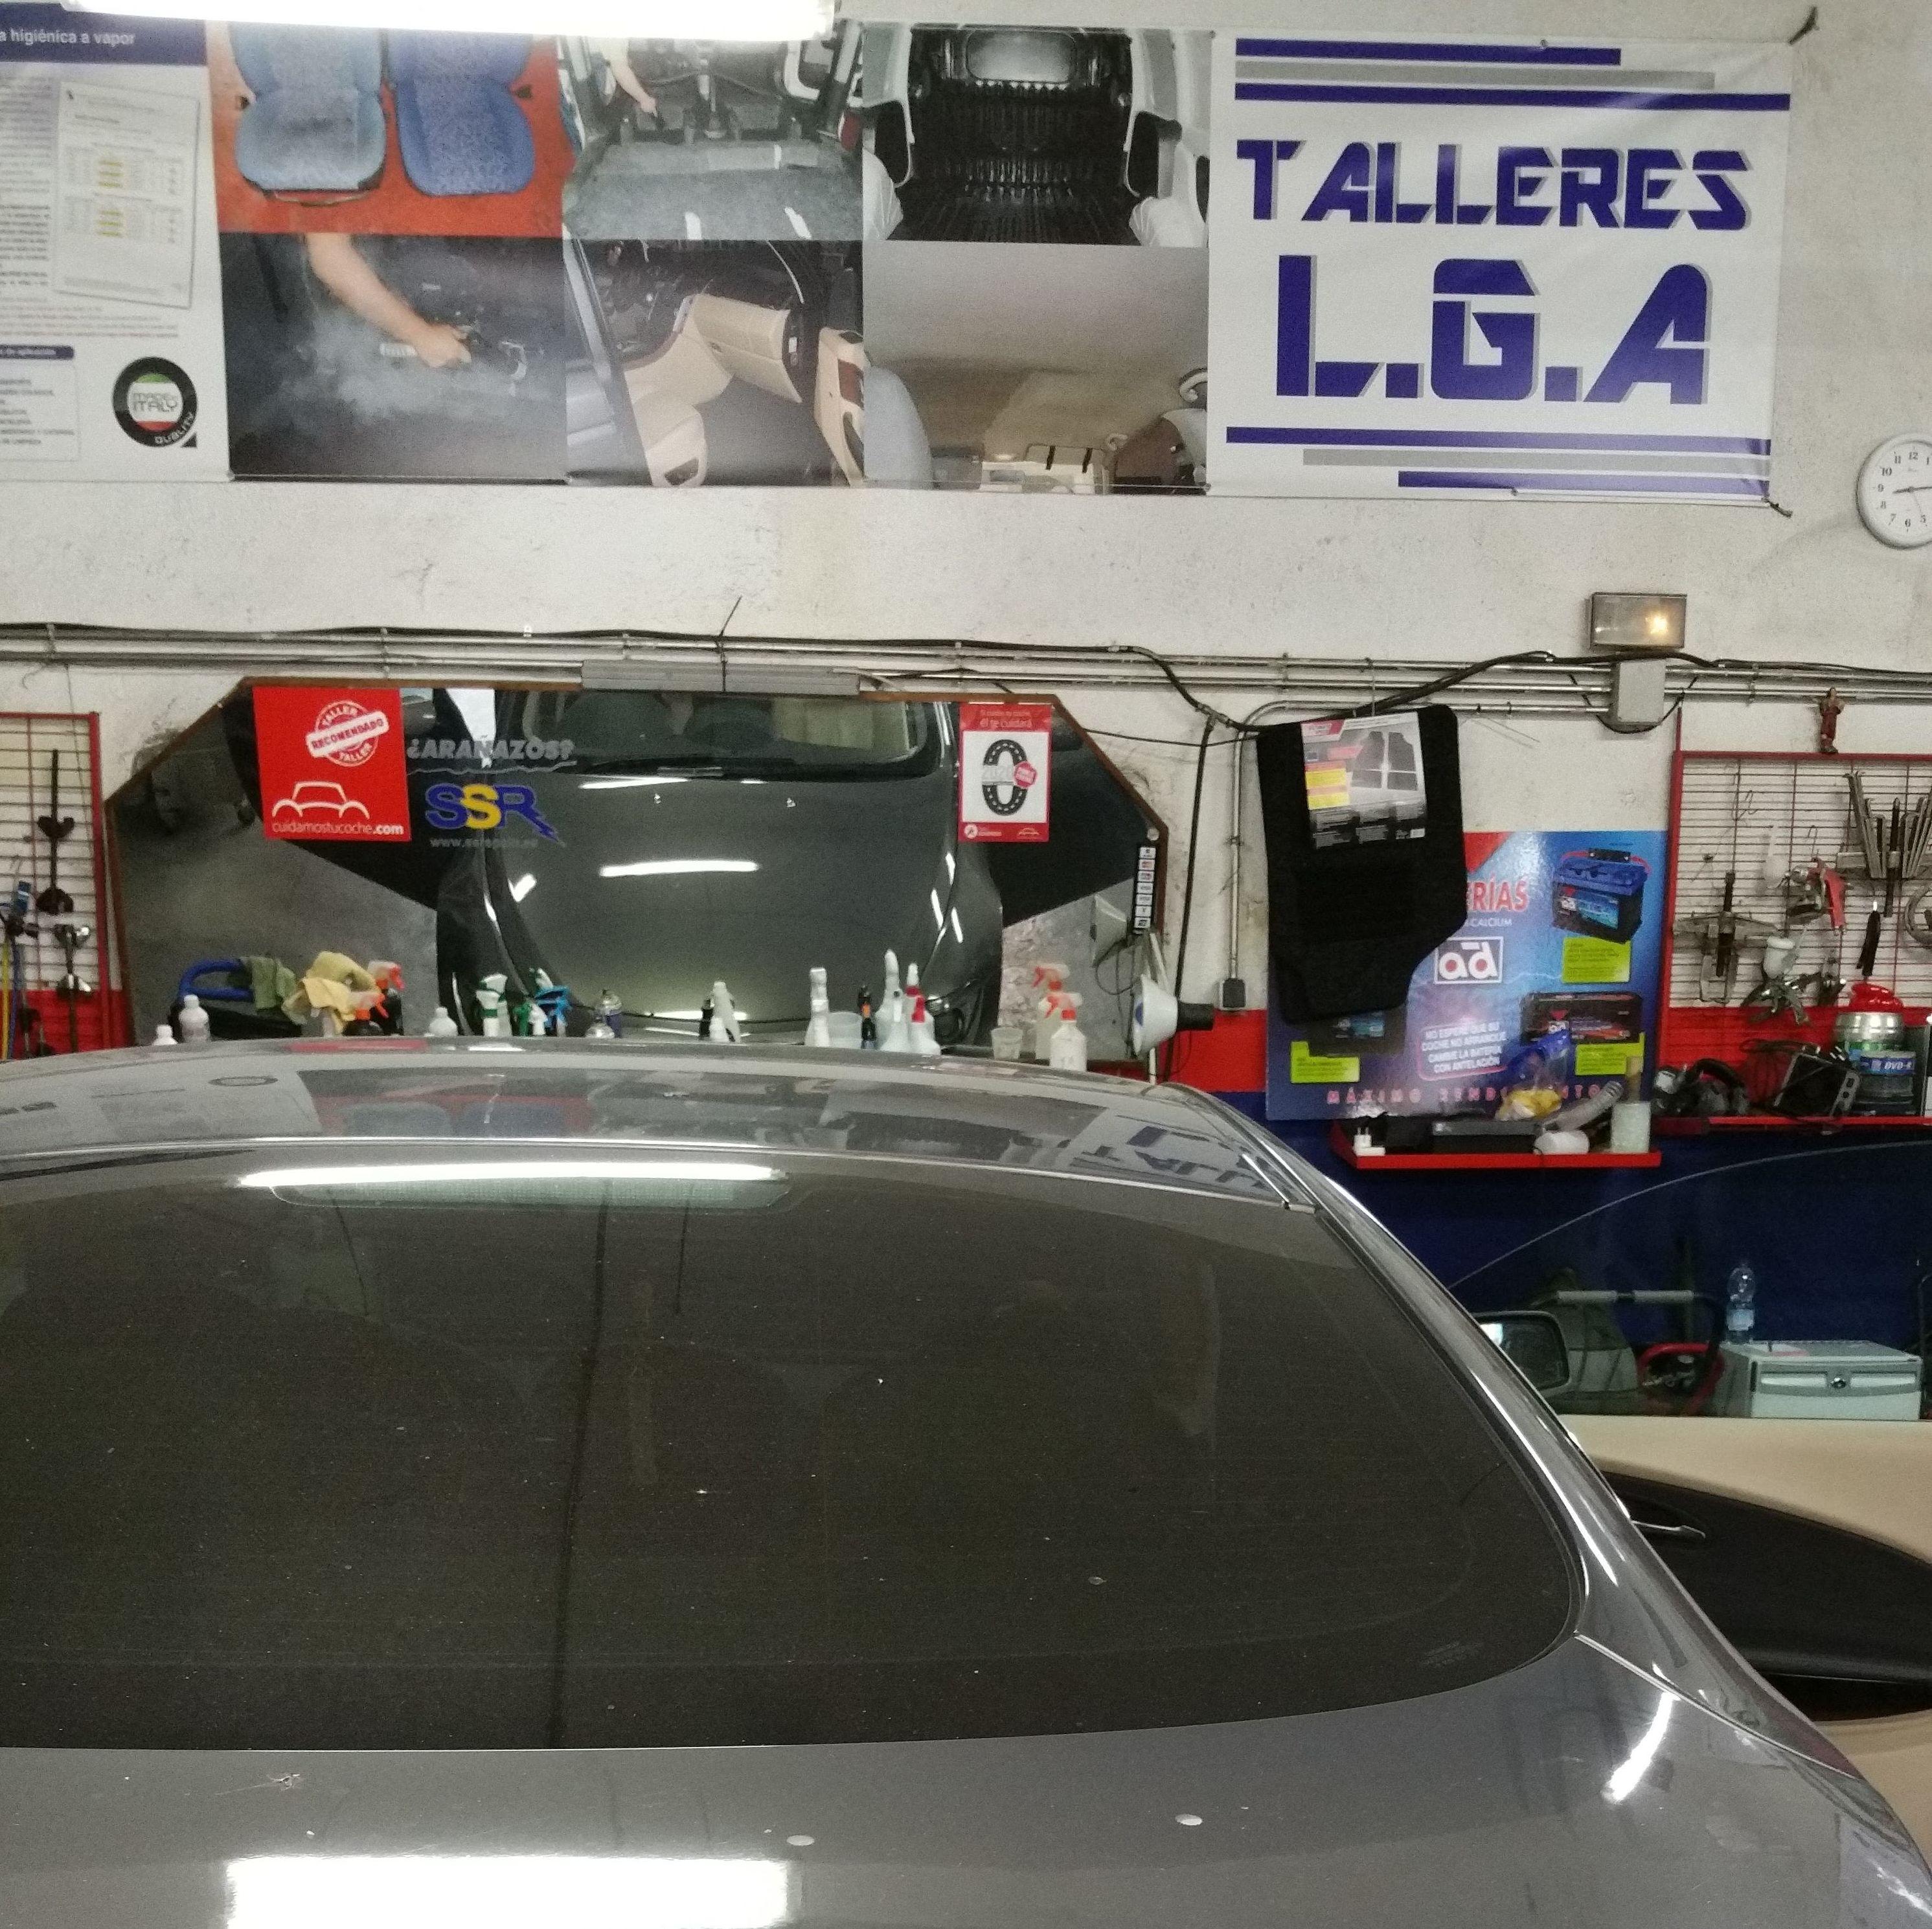 Foto 57 de Talleres de automóviles en Getafe | Talleres LGA